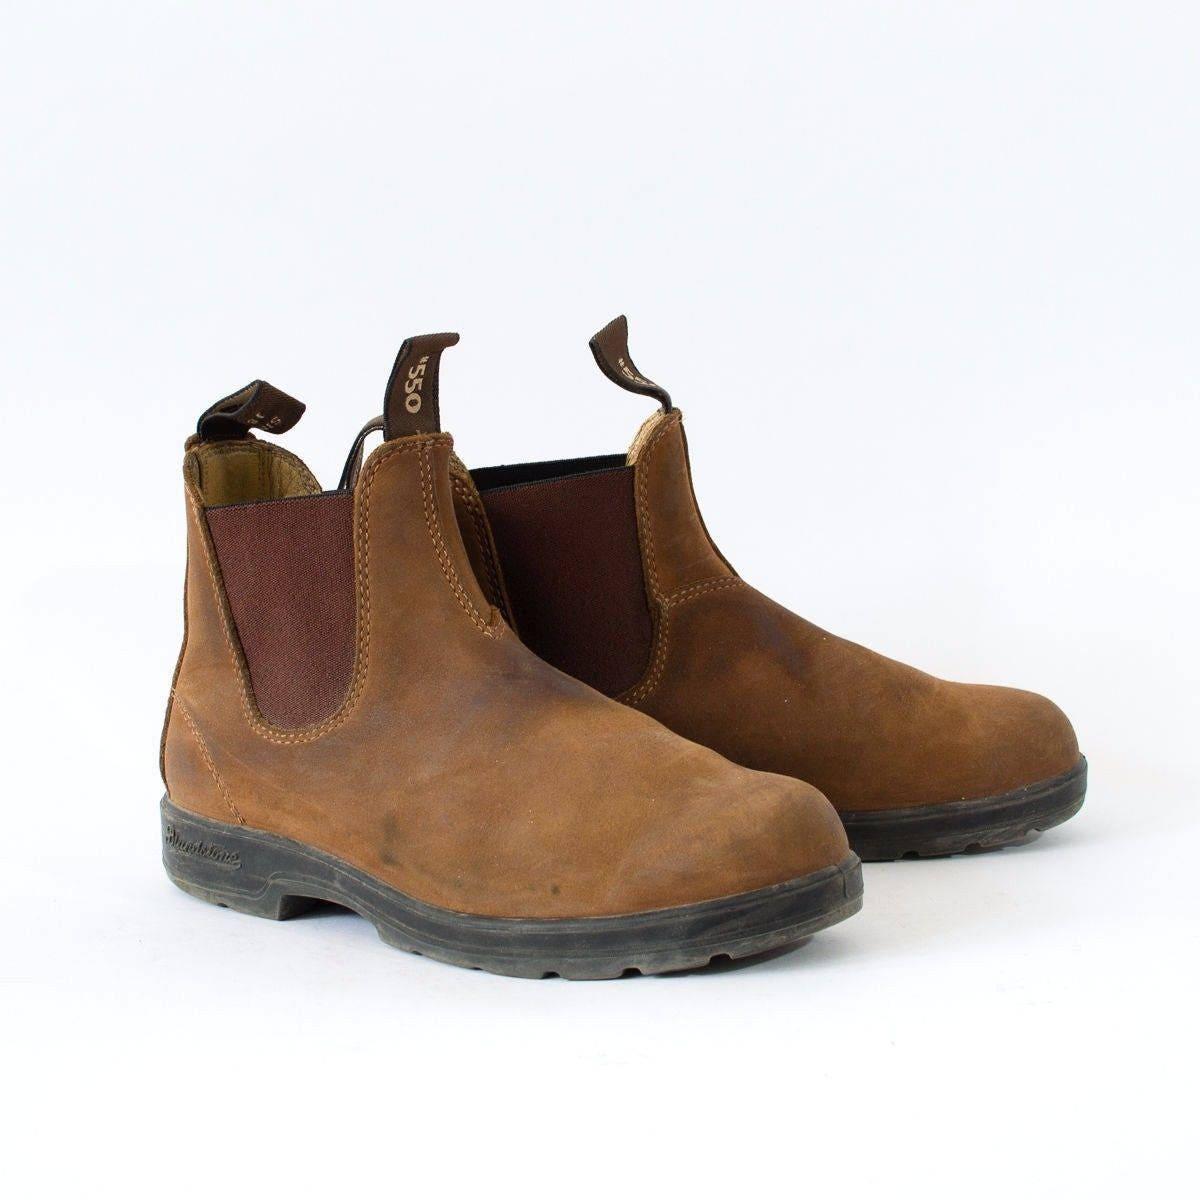 Vintage Brown Real Leather Chelsea Boots Festival Mens UK 6 EU 39 US 7